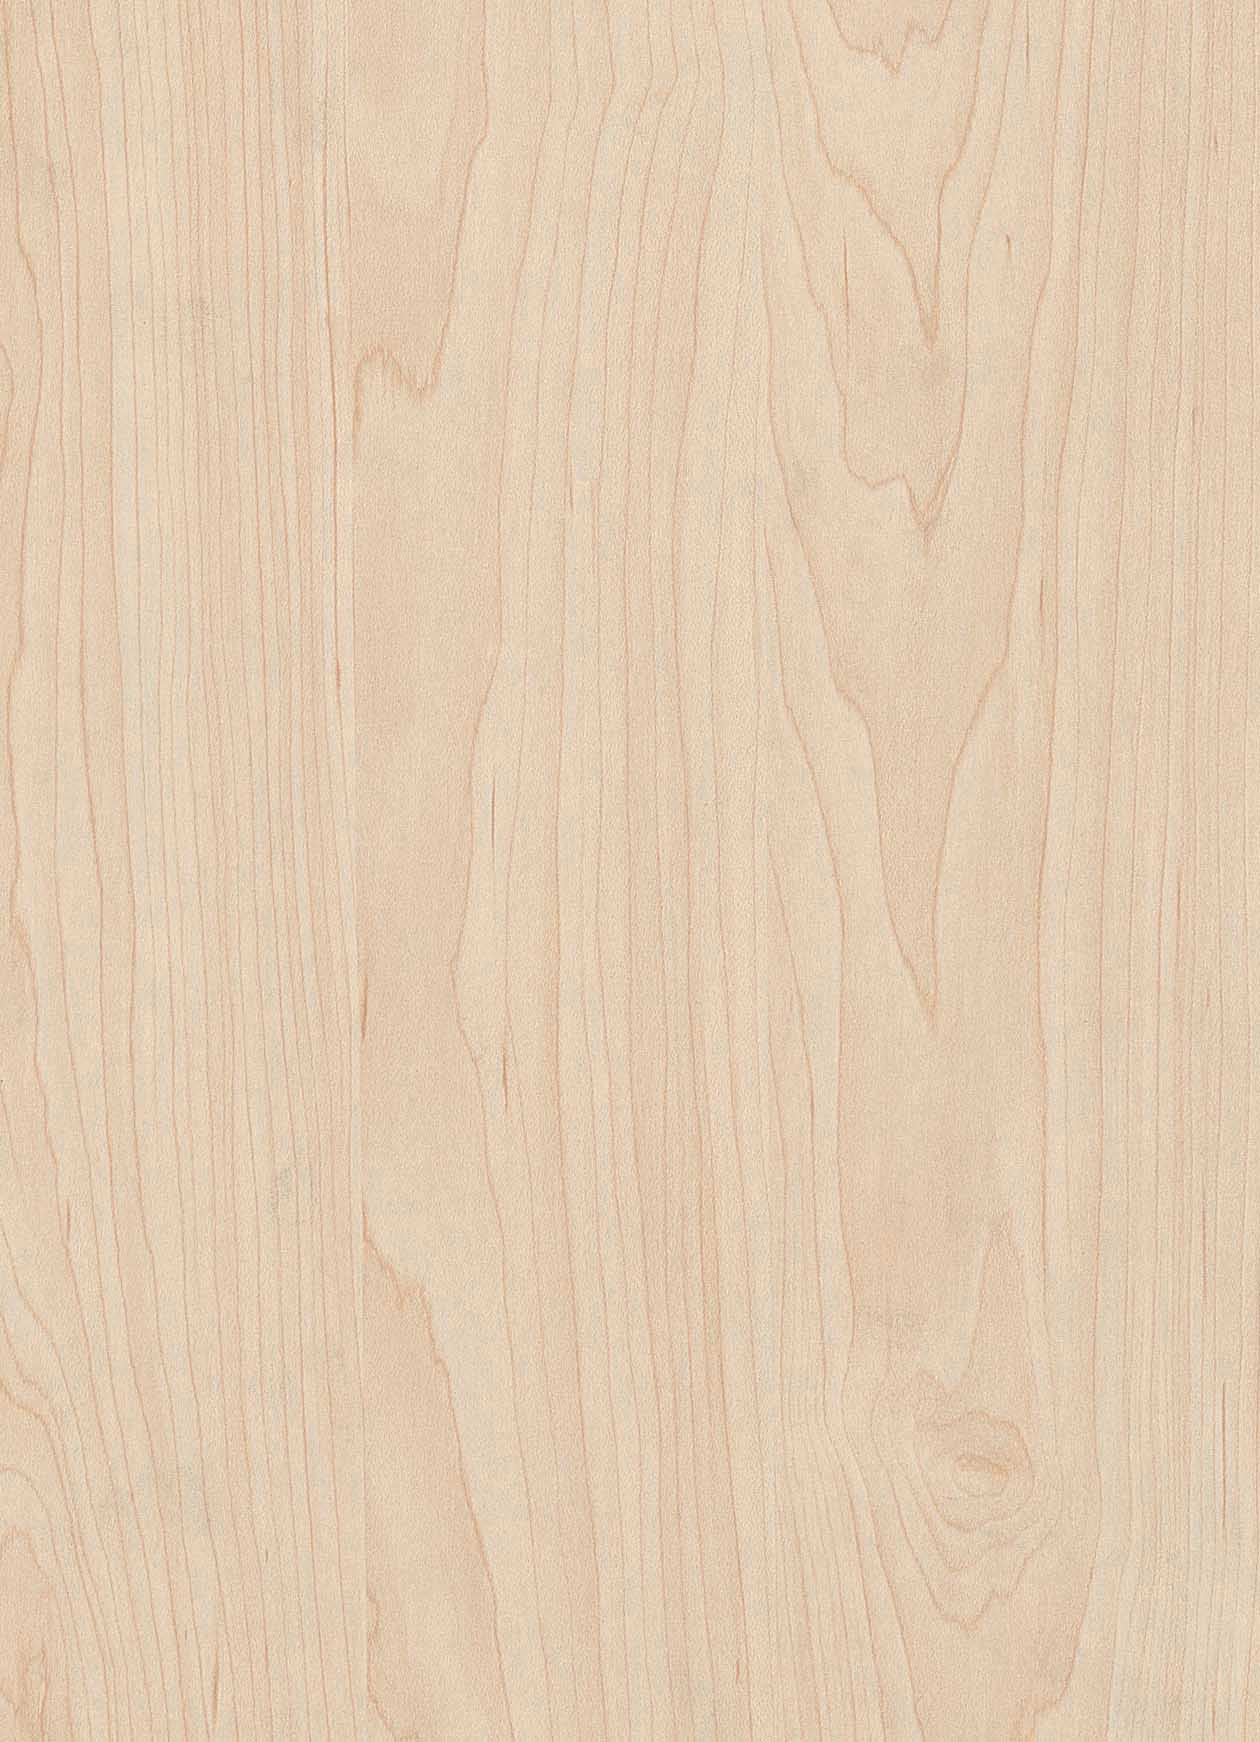 Maple Plywood Plywood